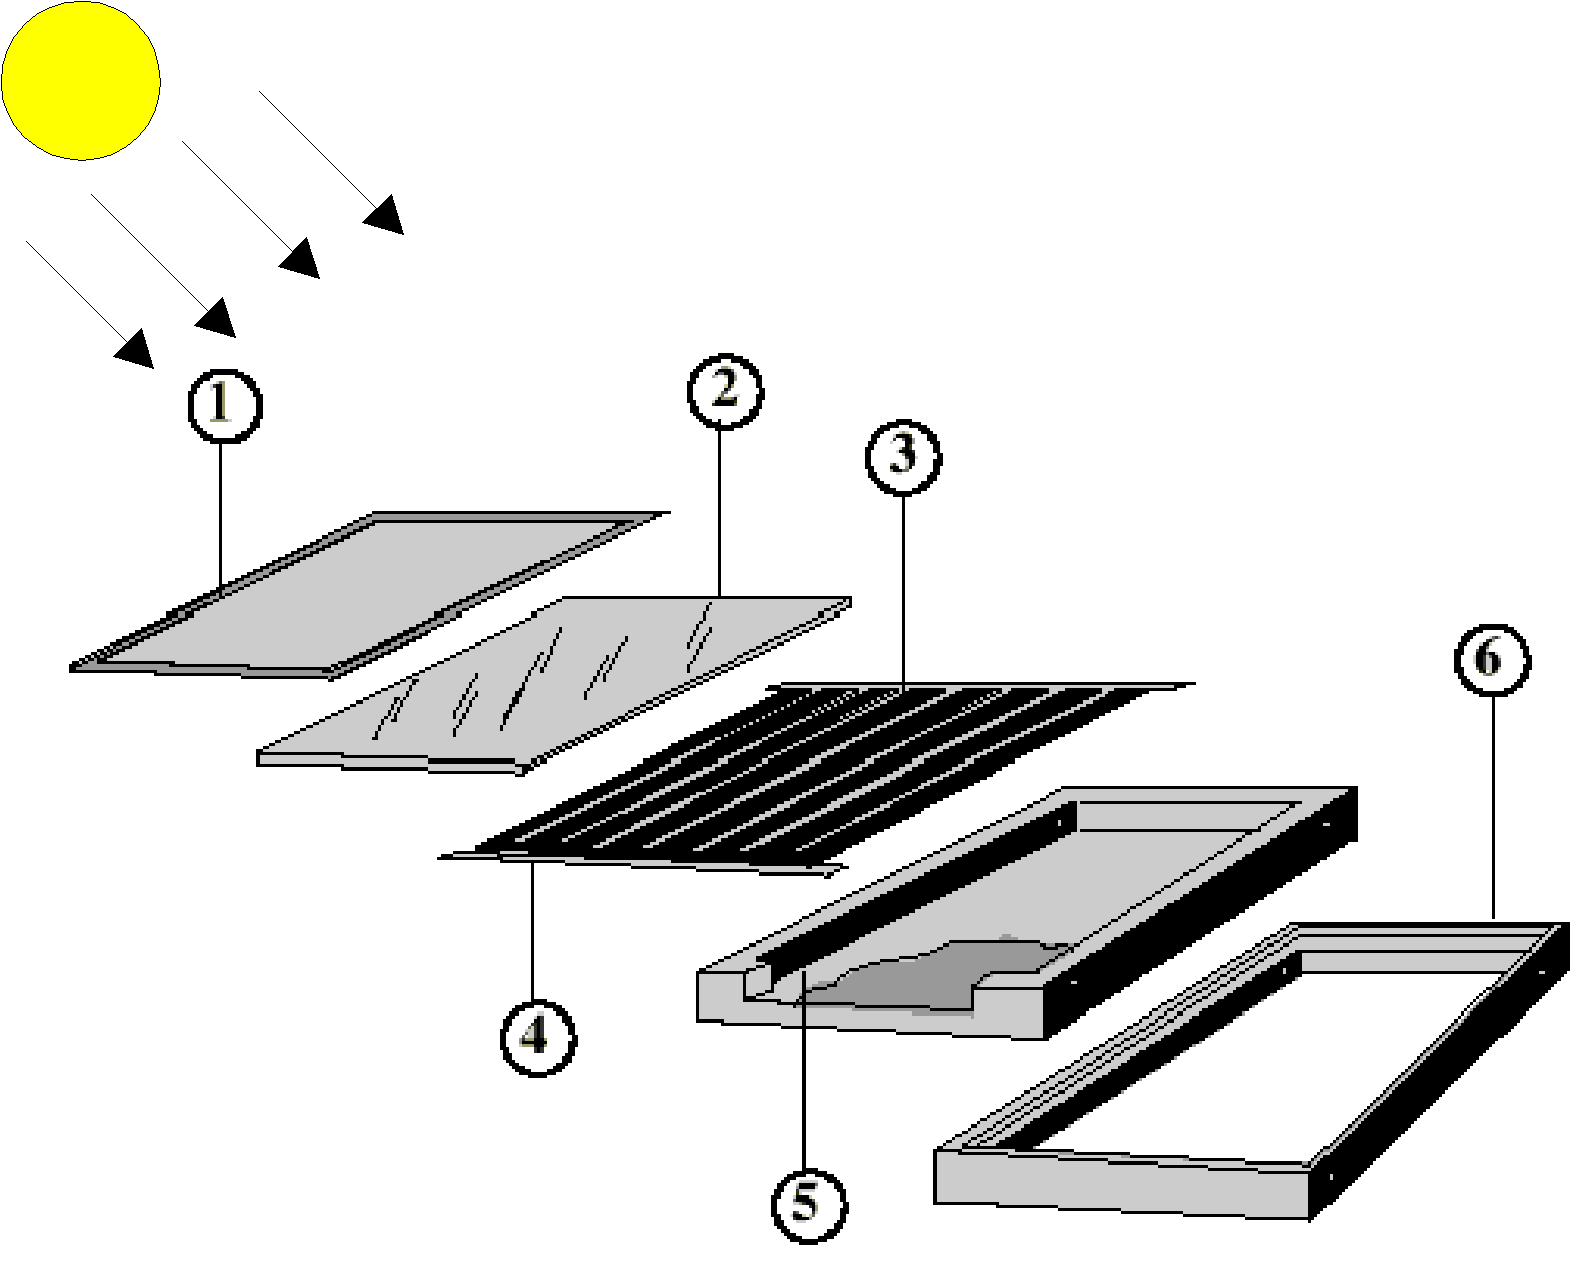 Energía nuclear y solar